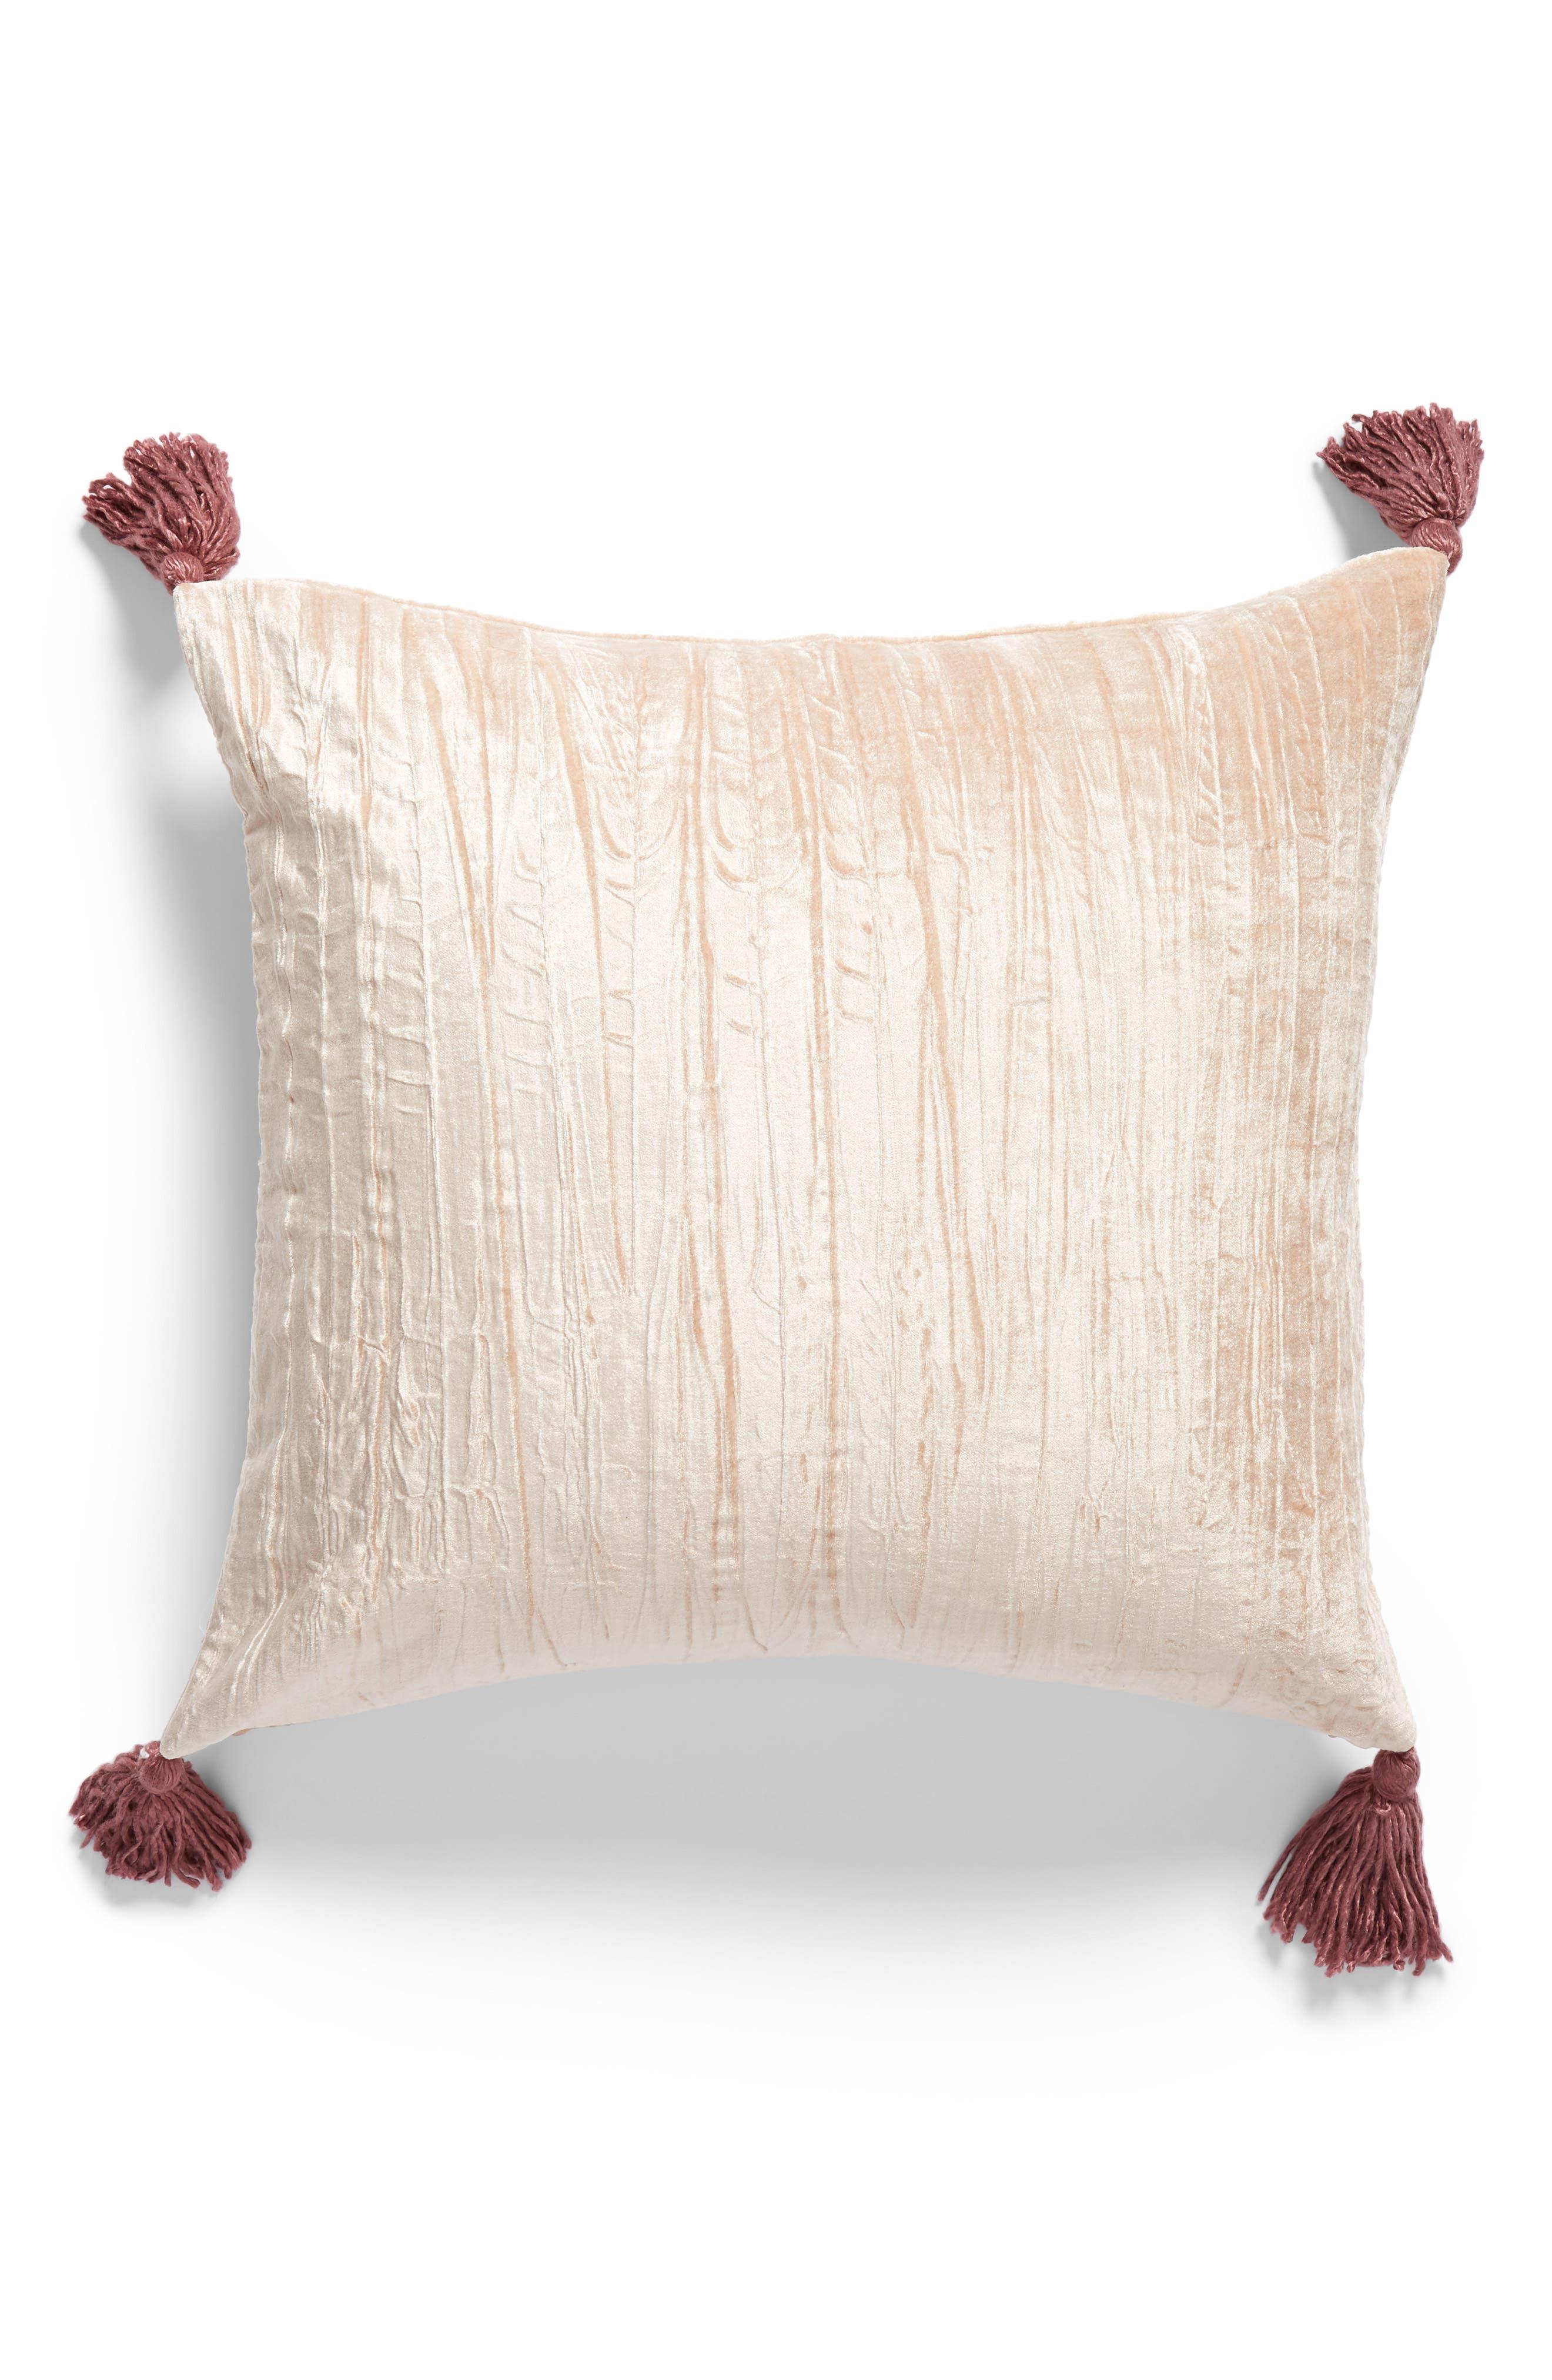 Tassel Crushed Velvet Accent Pillow, Main, color, PINK HERO